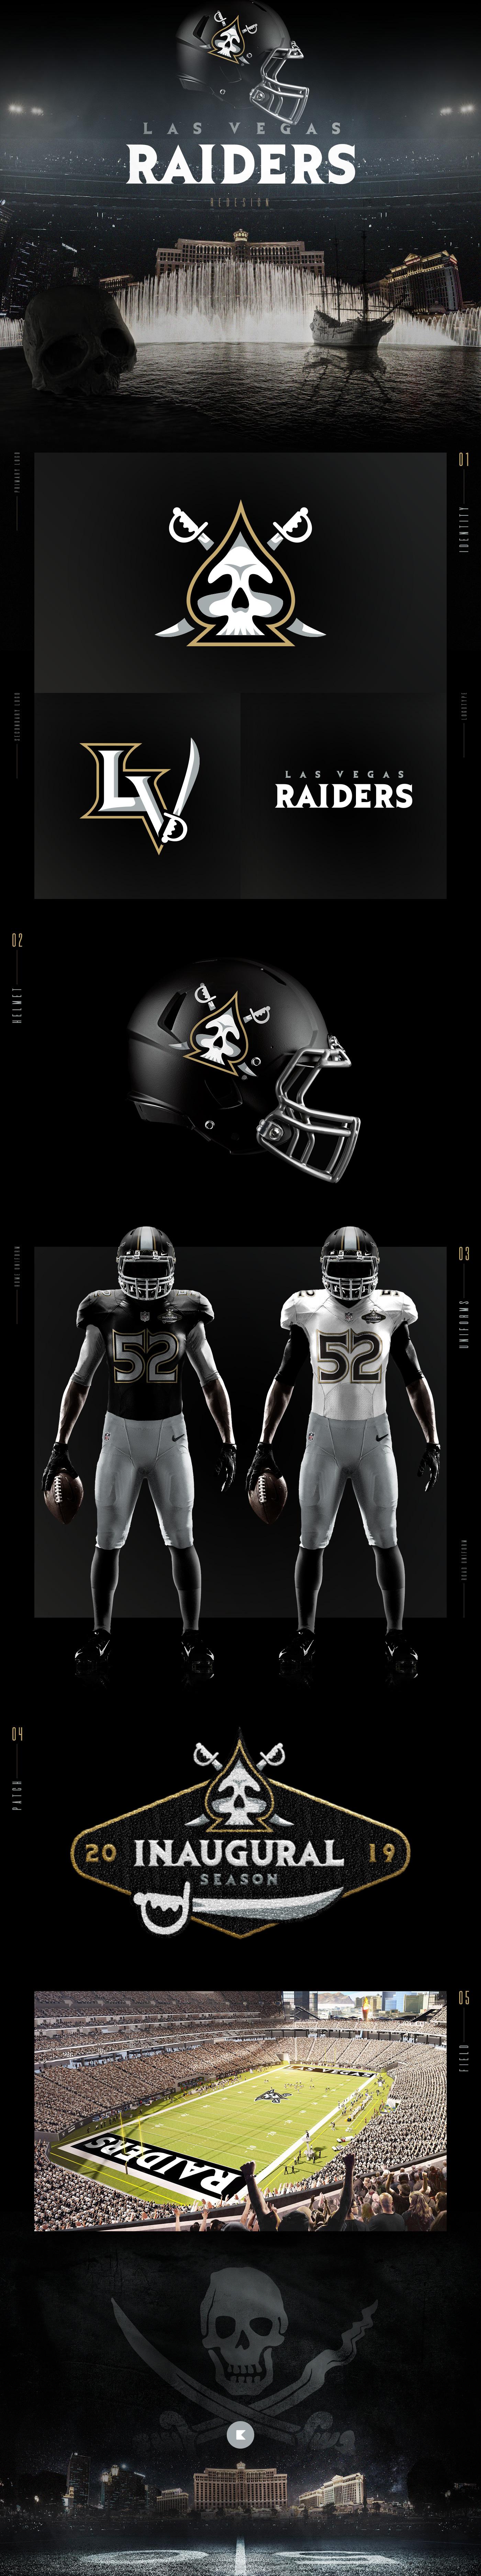 football sports nfl raiders Las Vegas redesign concept uniforms Helmet logo